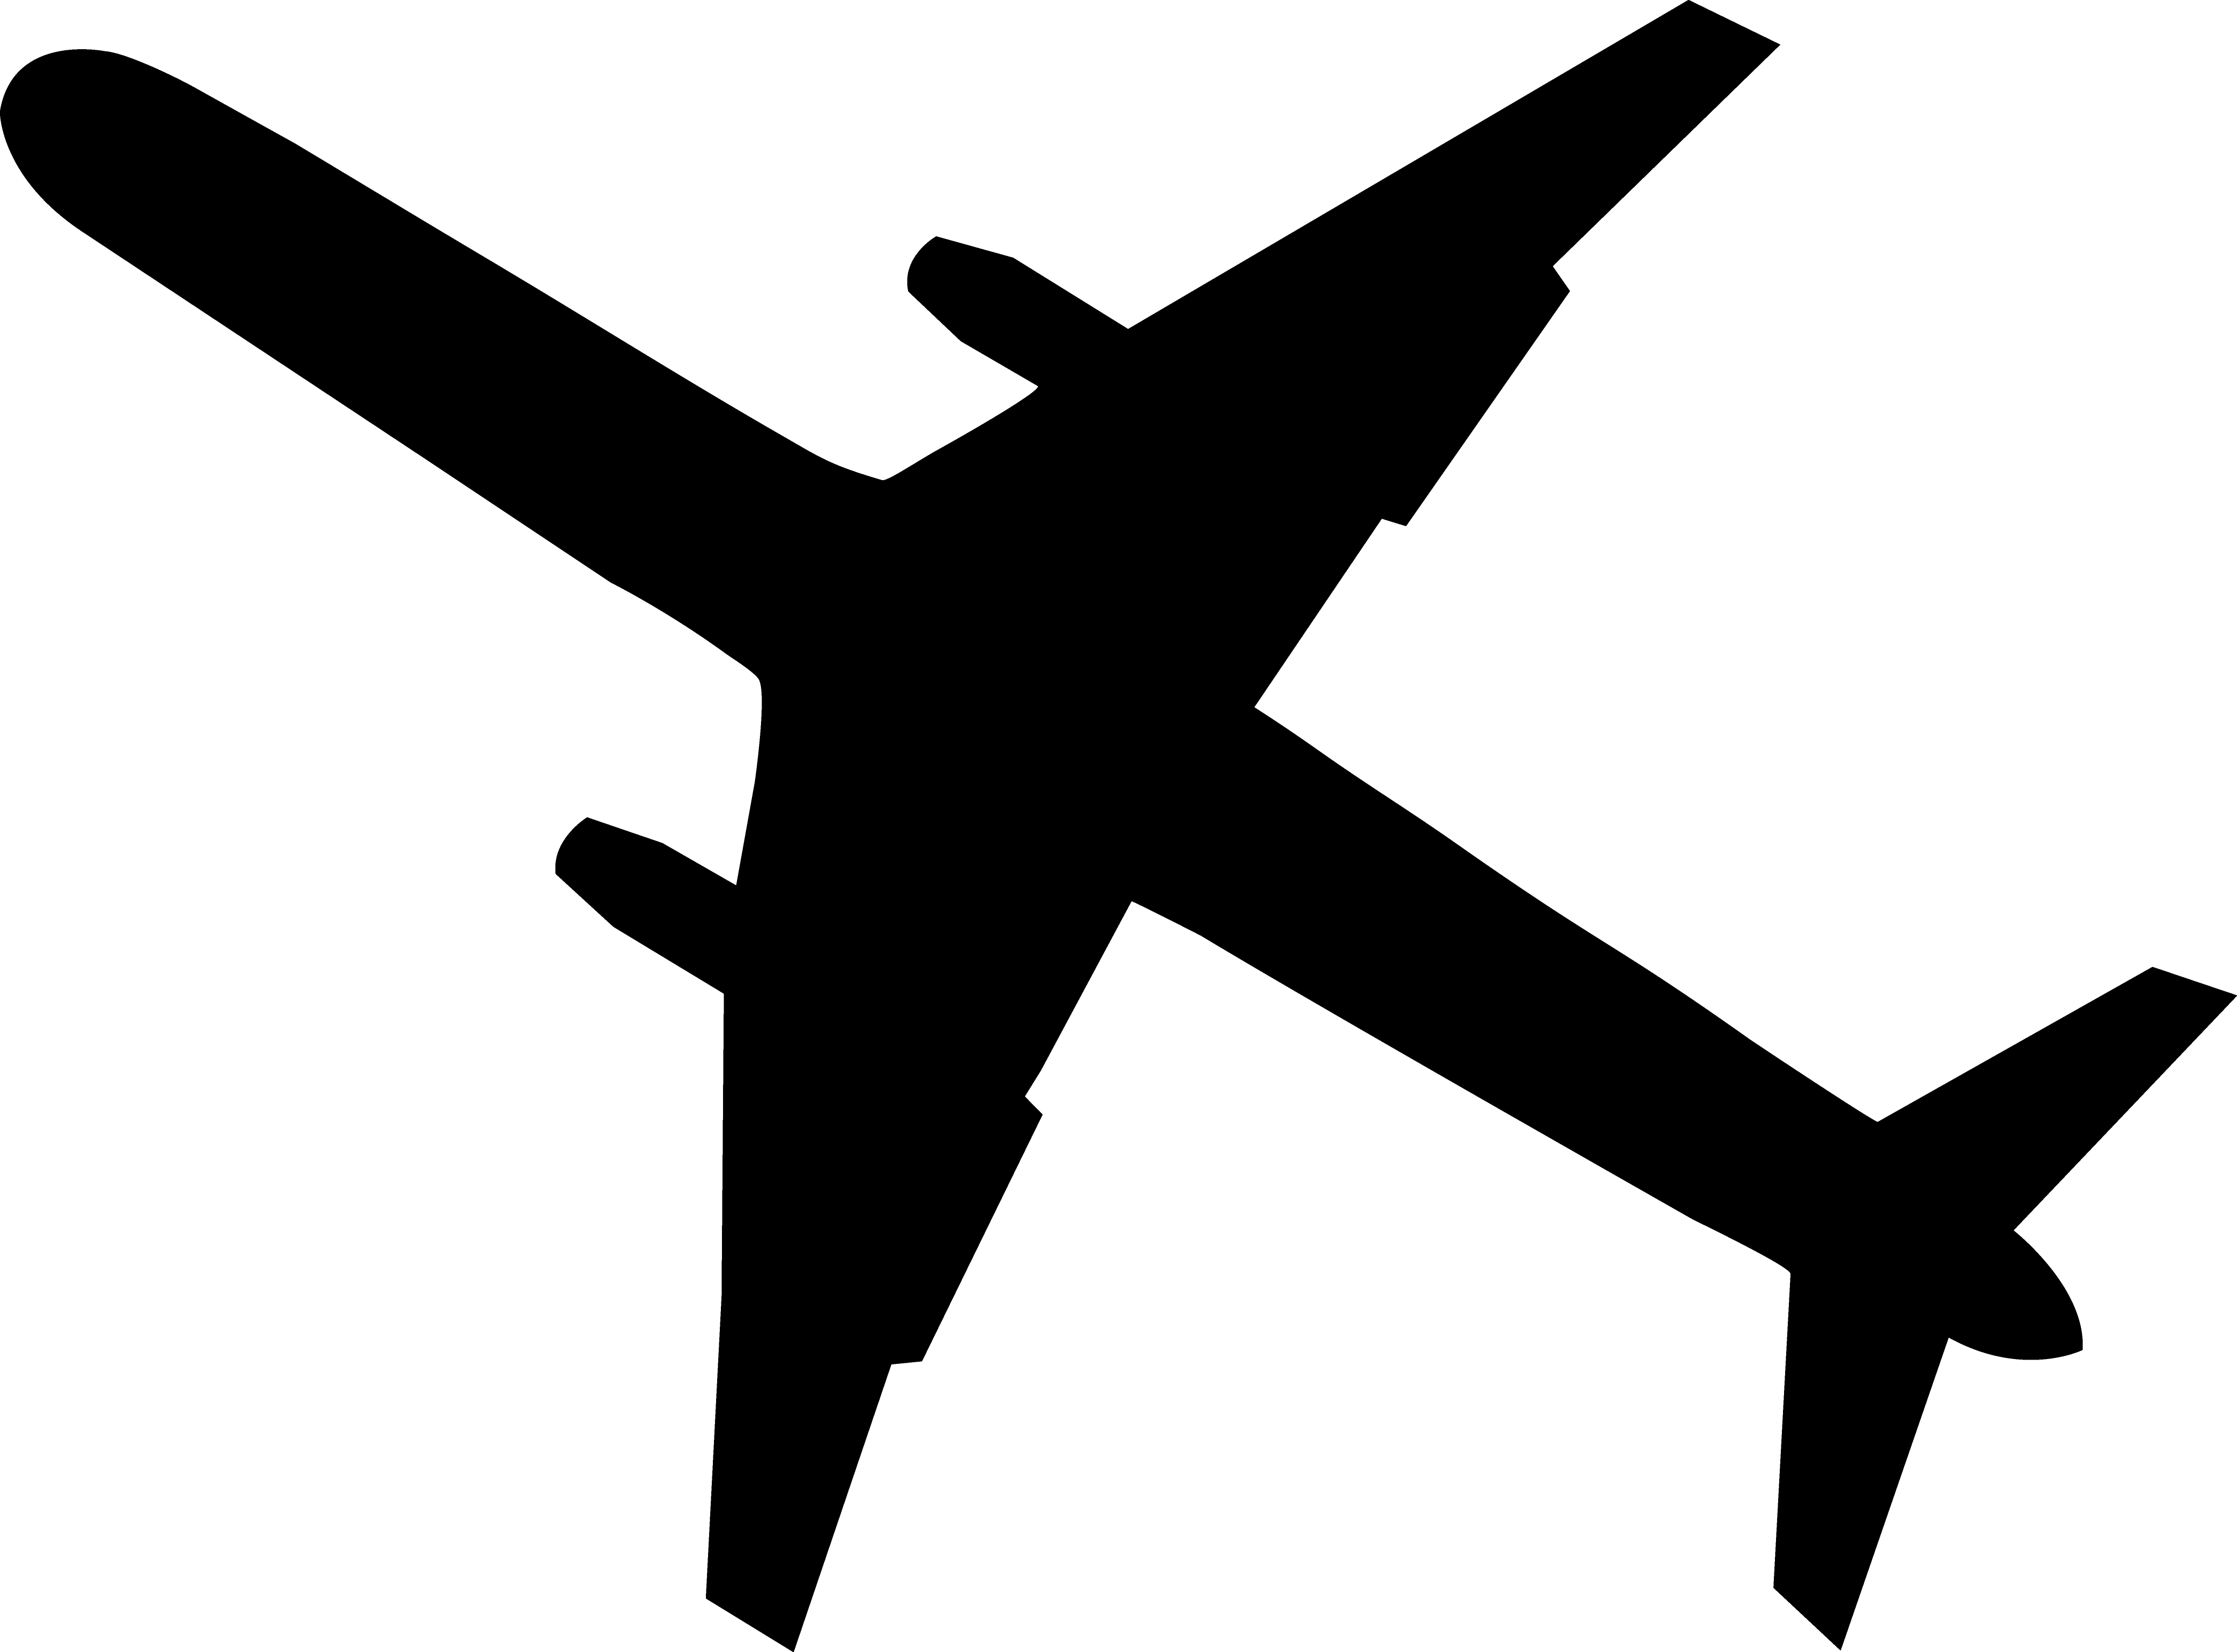 4183x3090 Airplane Shadow Cliparts